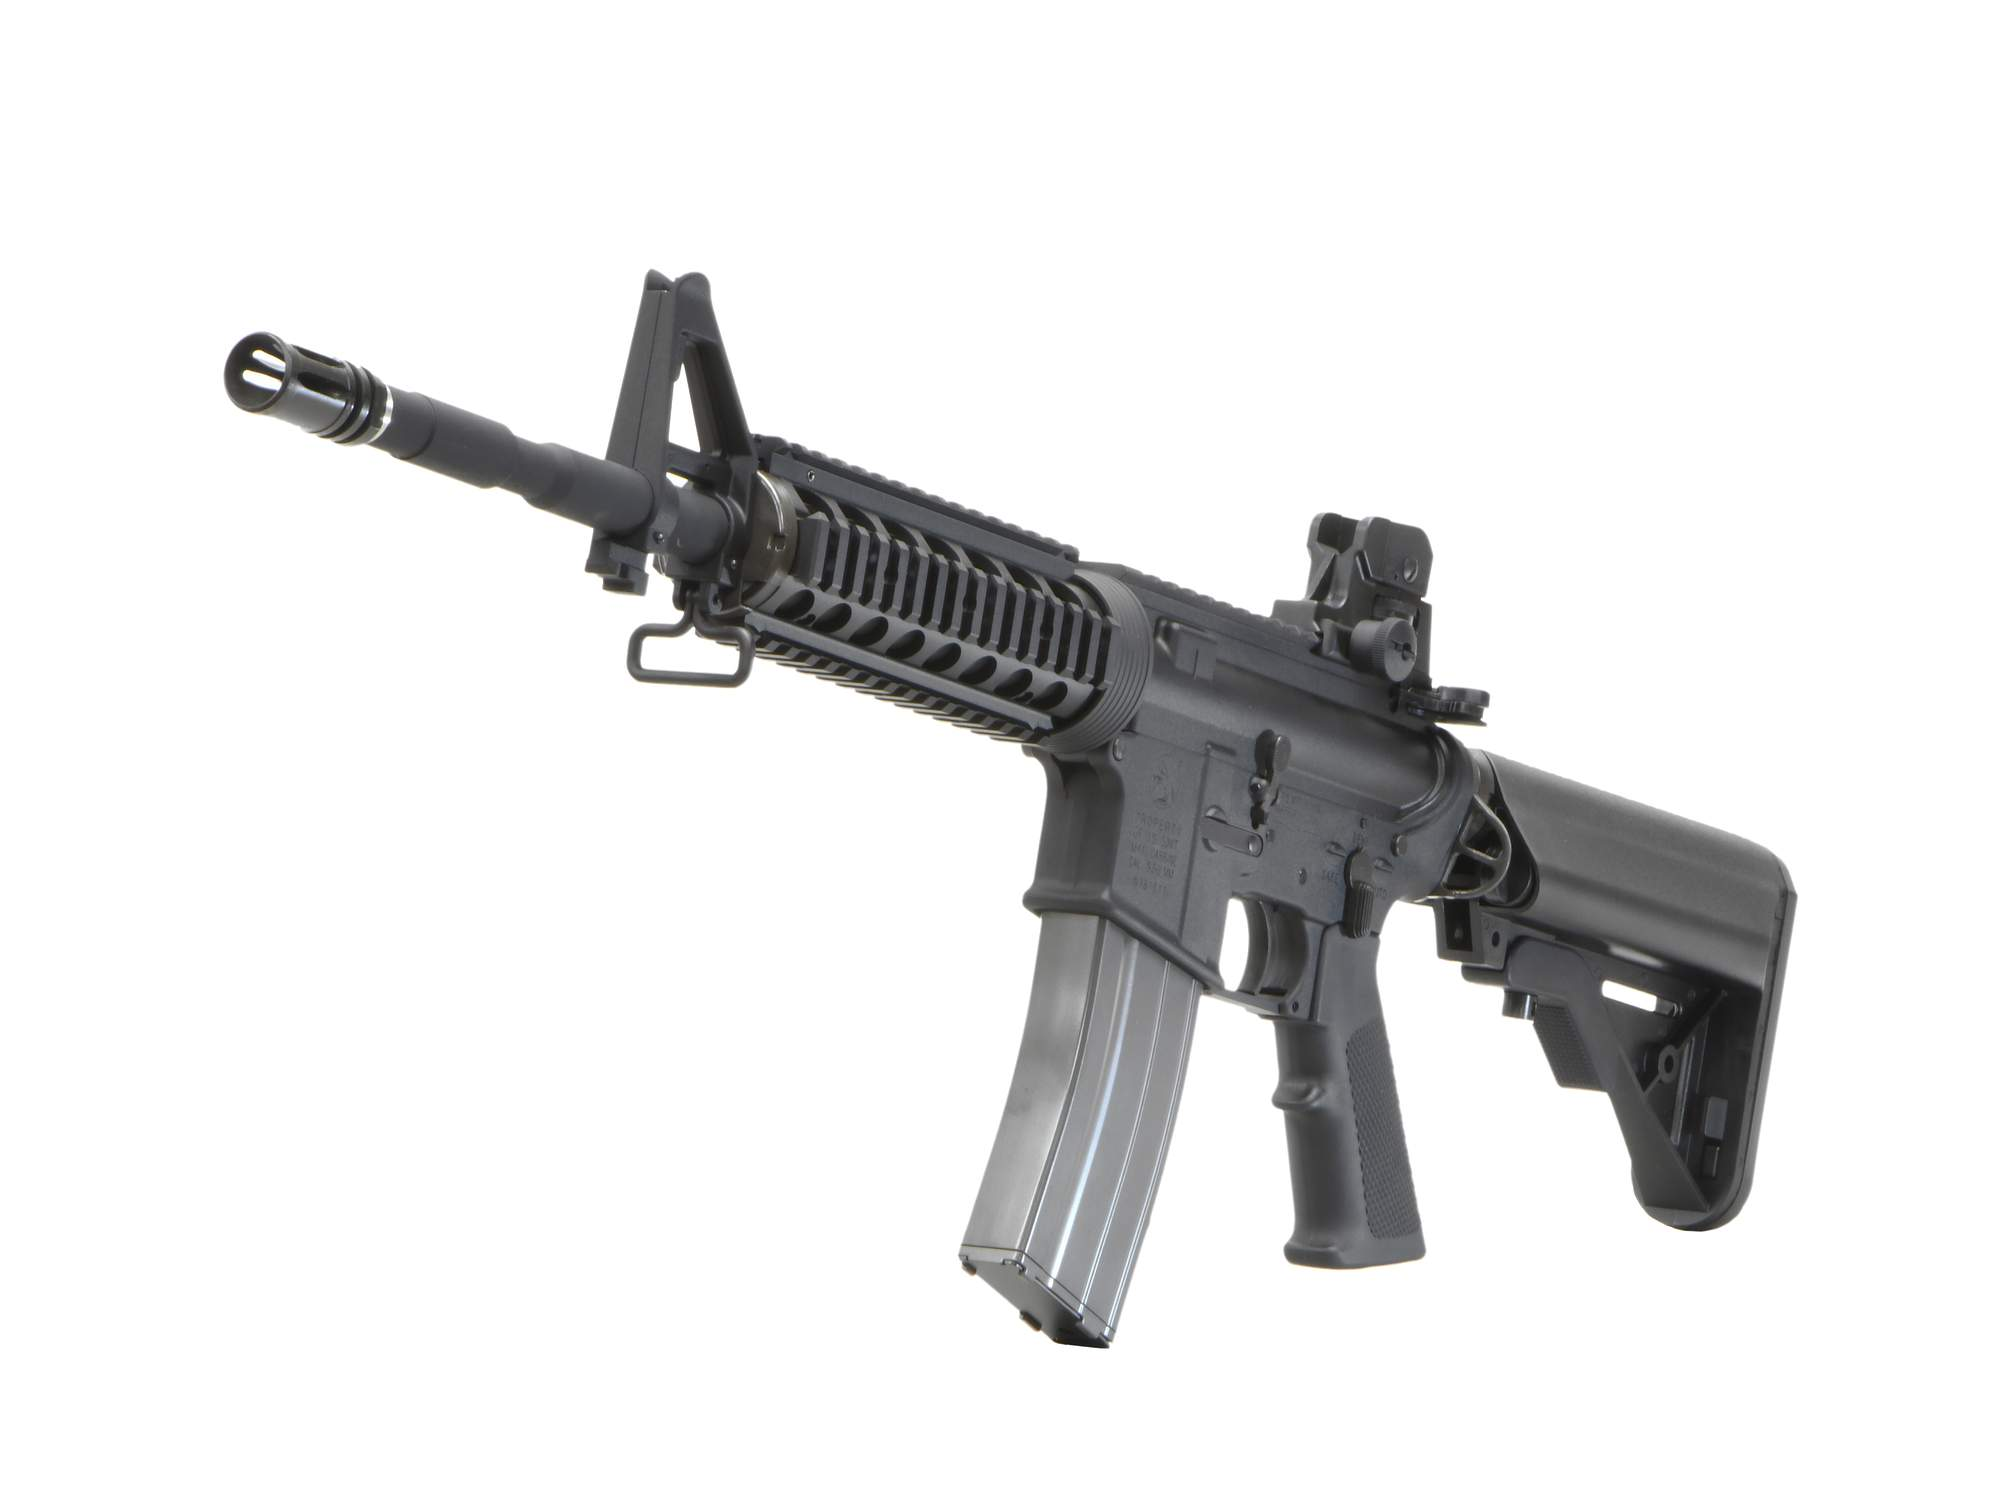 CyberGun Colt M4 RIS 14.5in GBBR V2 (JPver.) [ガスガン]